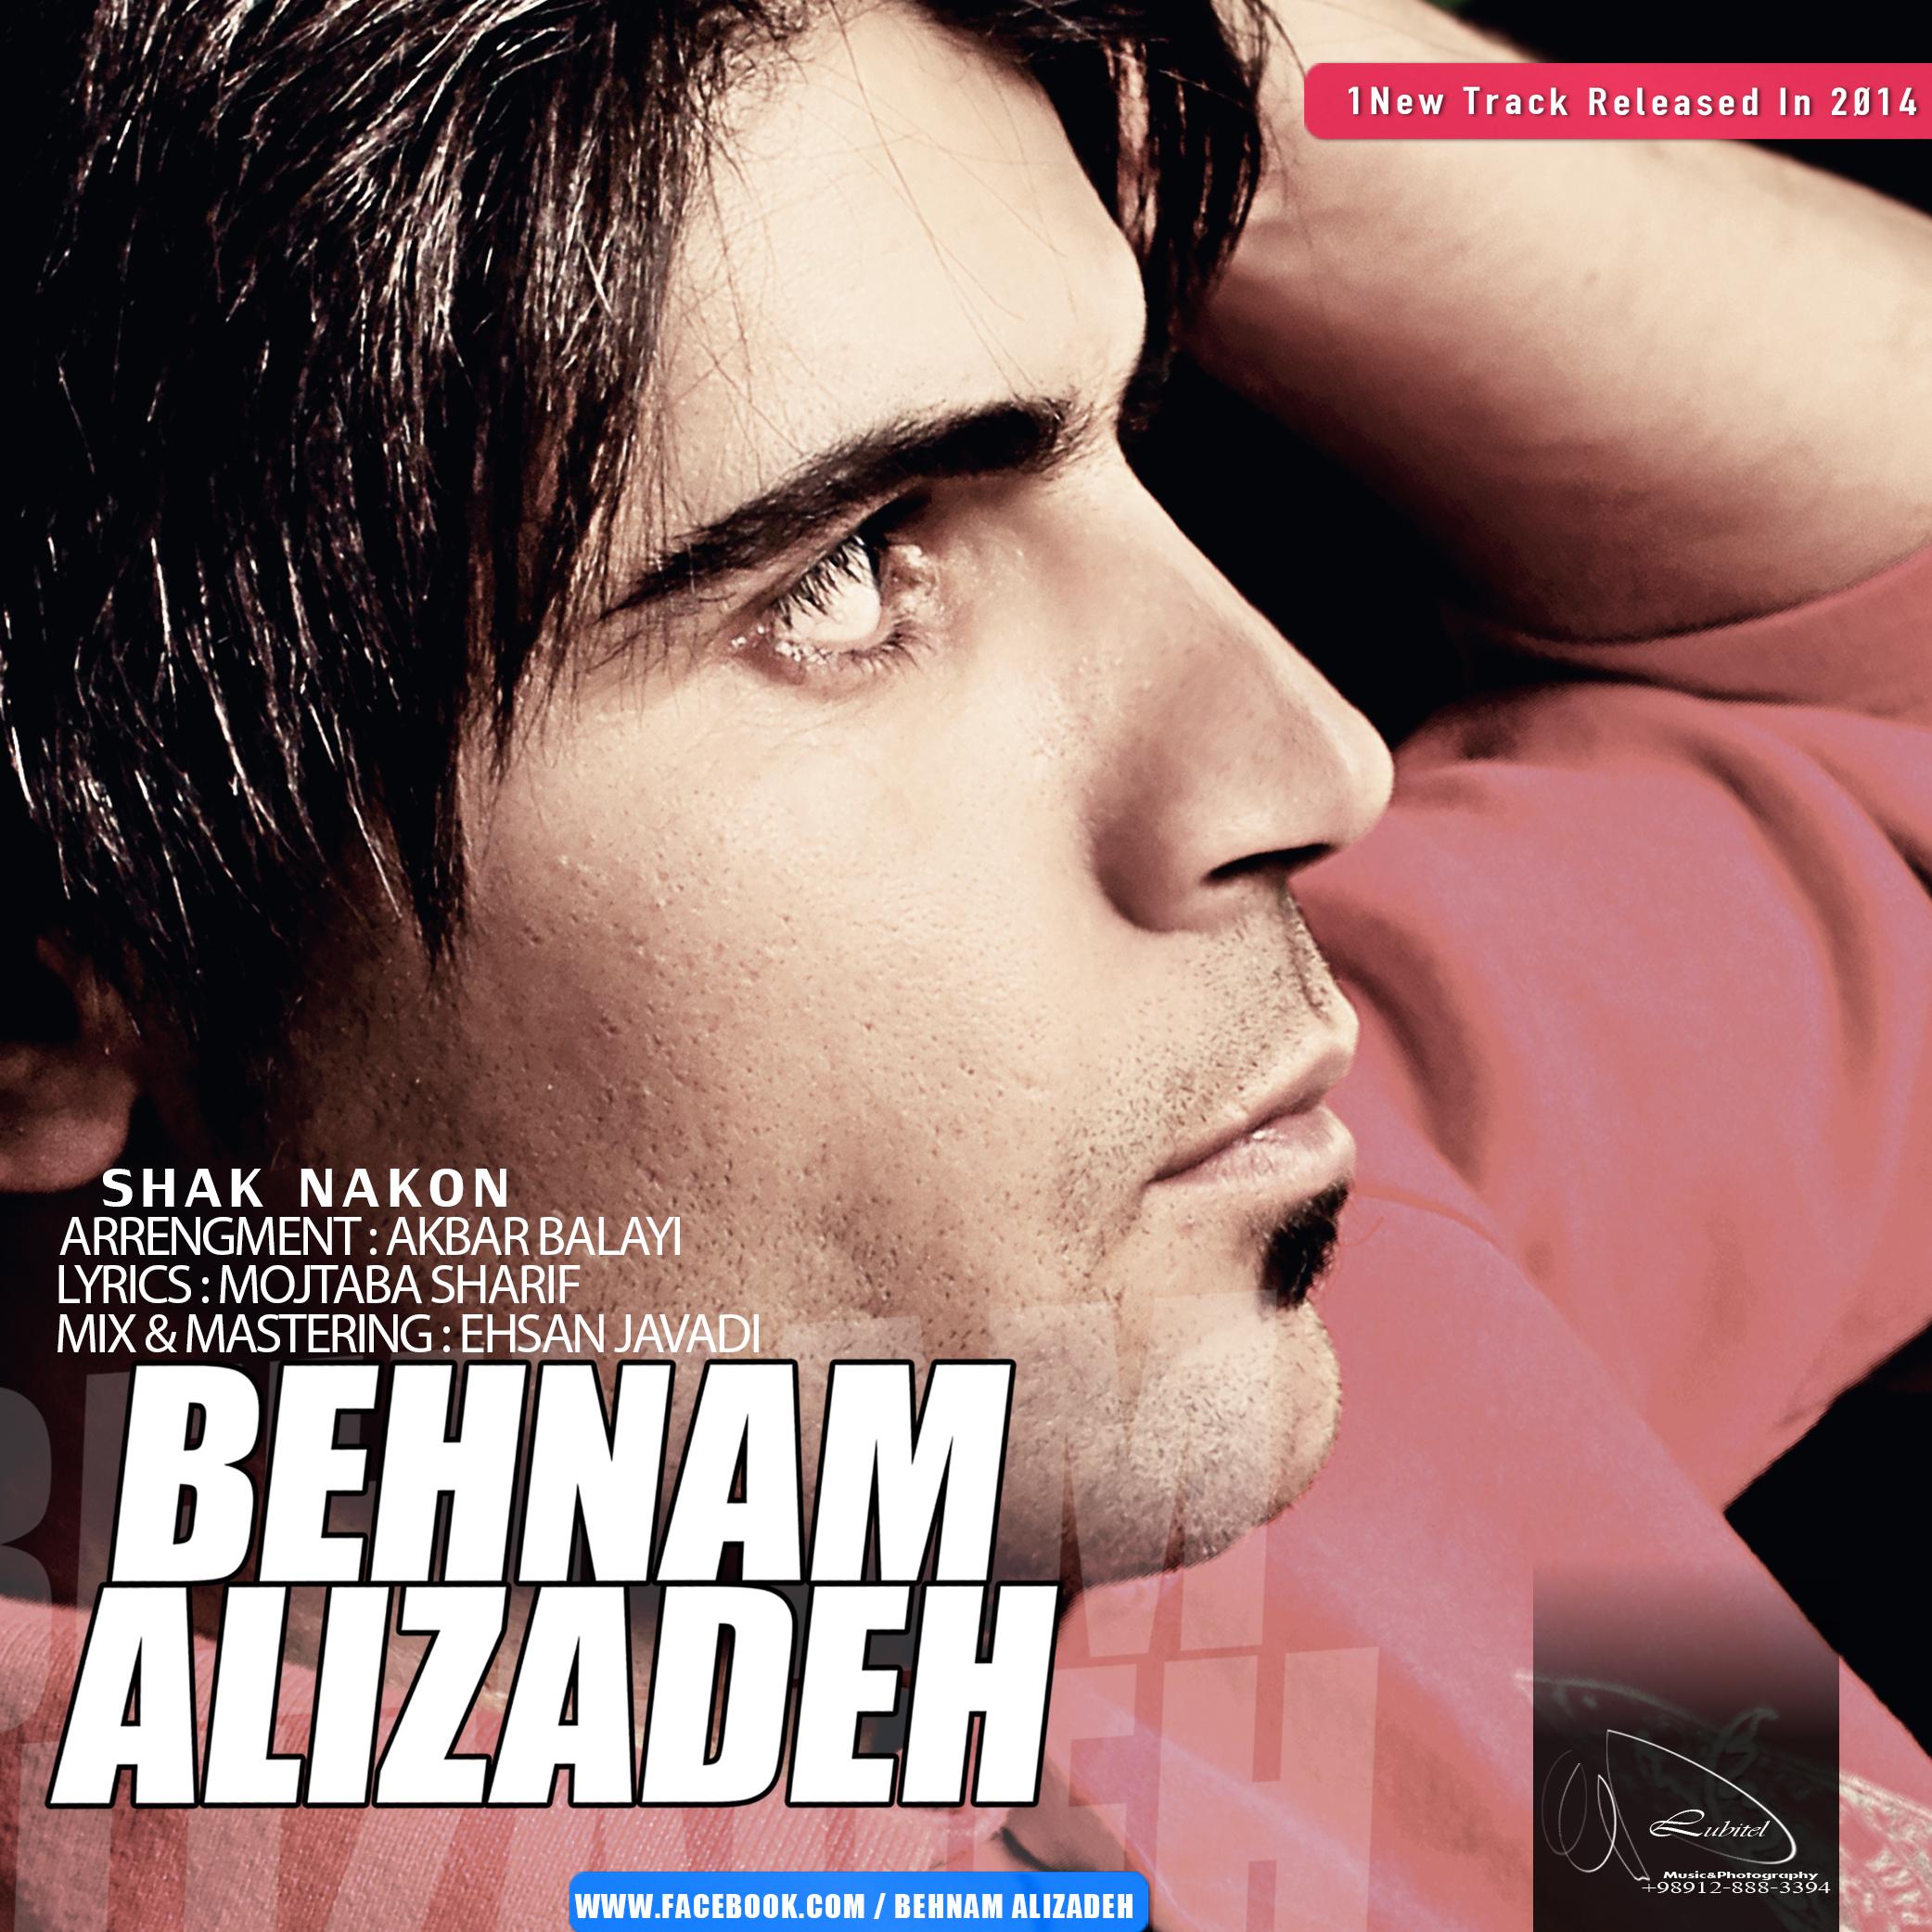 Behanam Alizadeh – Shak Nakon